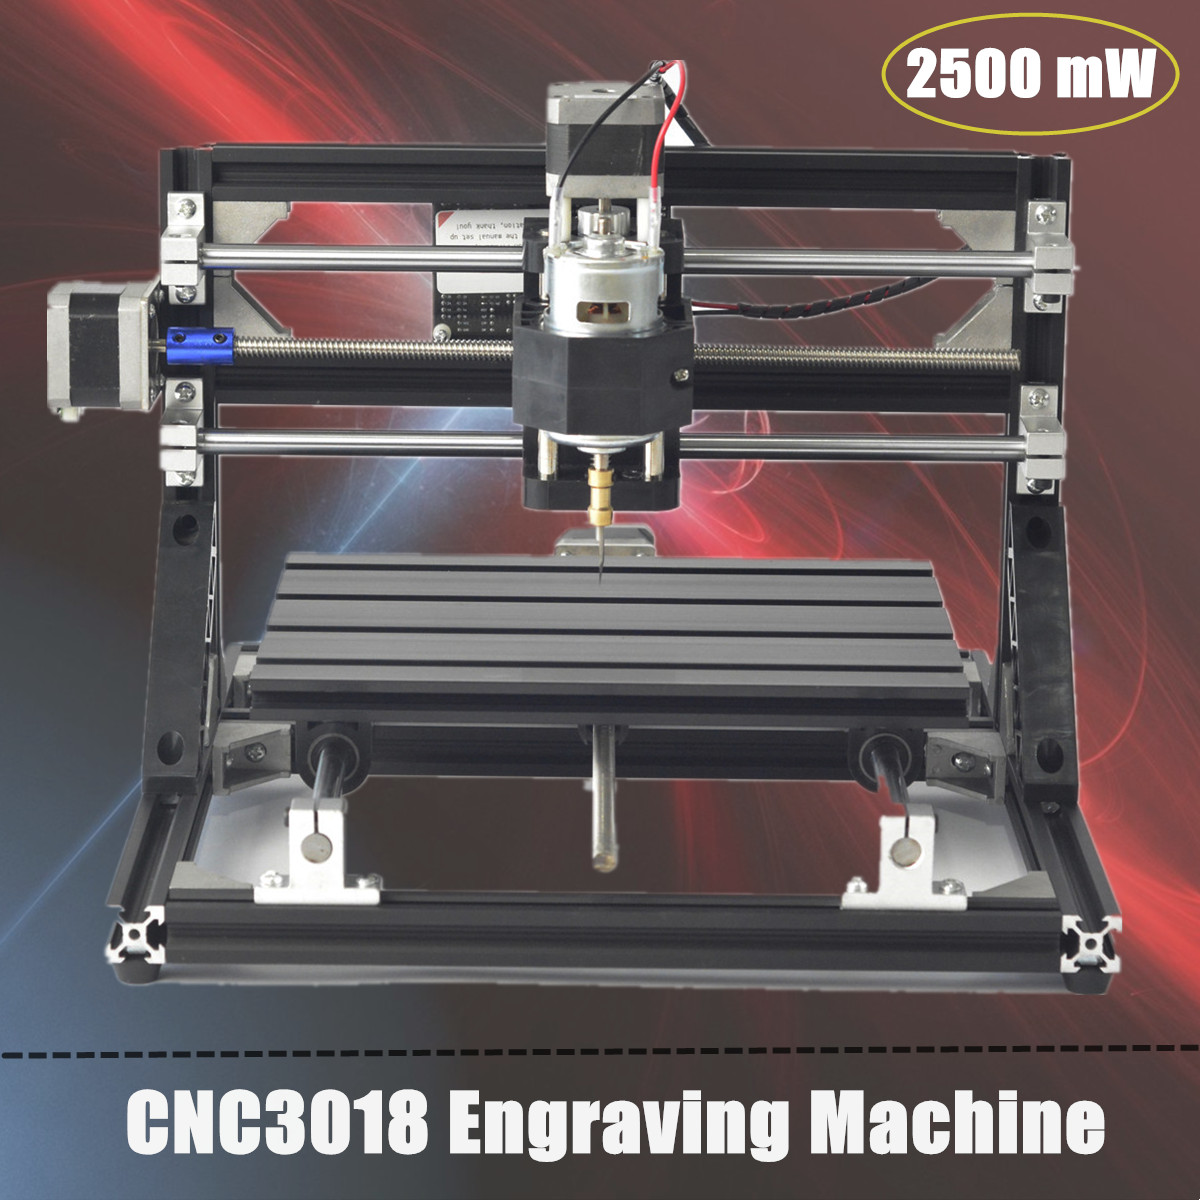 2500mw CNC3018 Diy Mini Cnc Engraving Machine,laser Engraving,Pcb PVC Milling Machine,wood Router,cnc 3018,best Advanced Toys